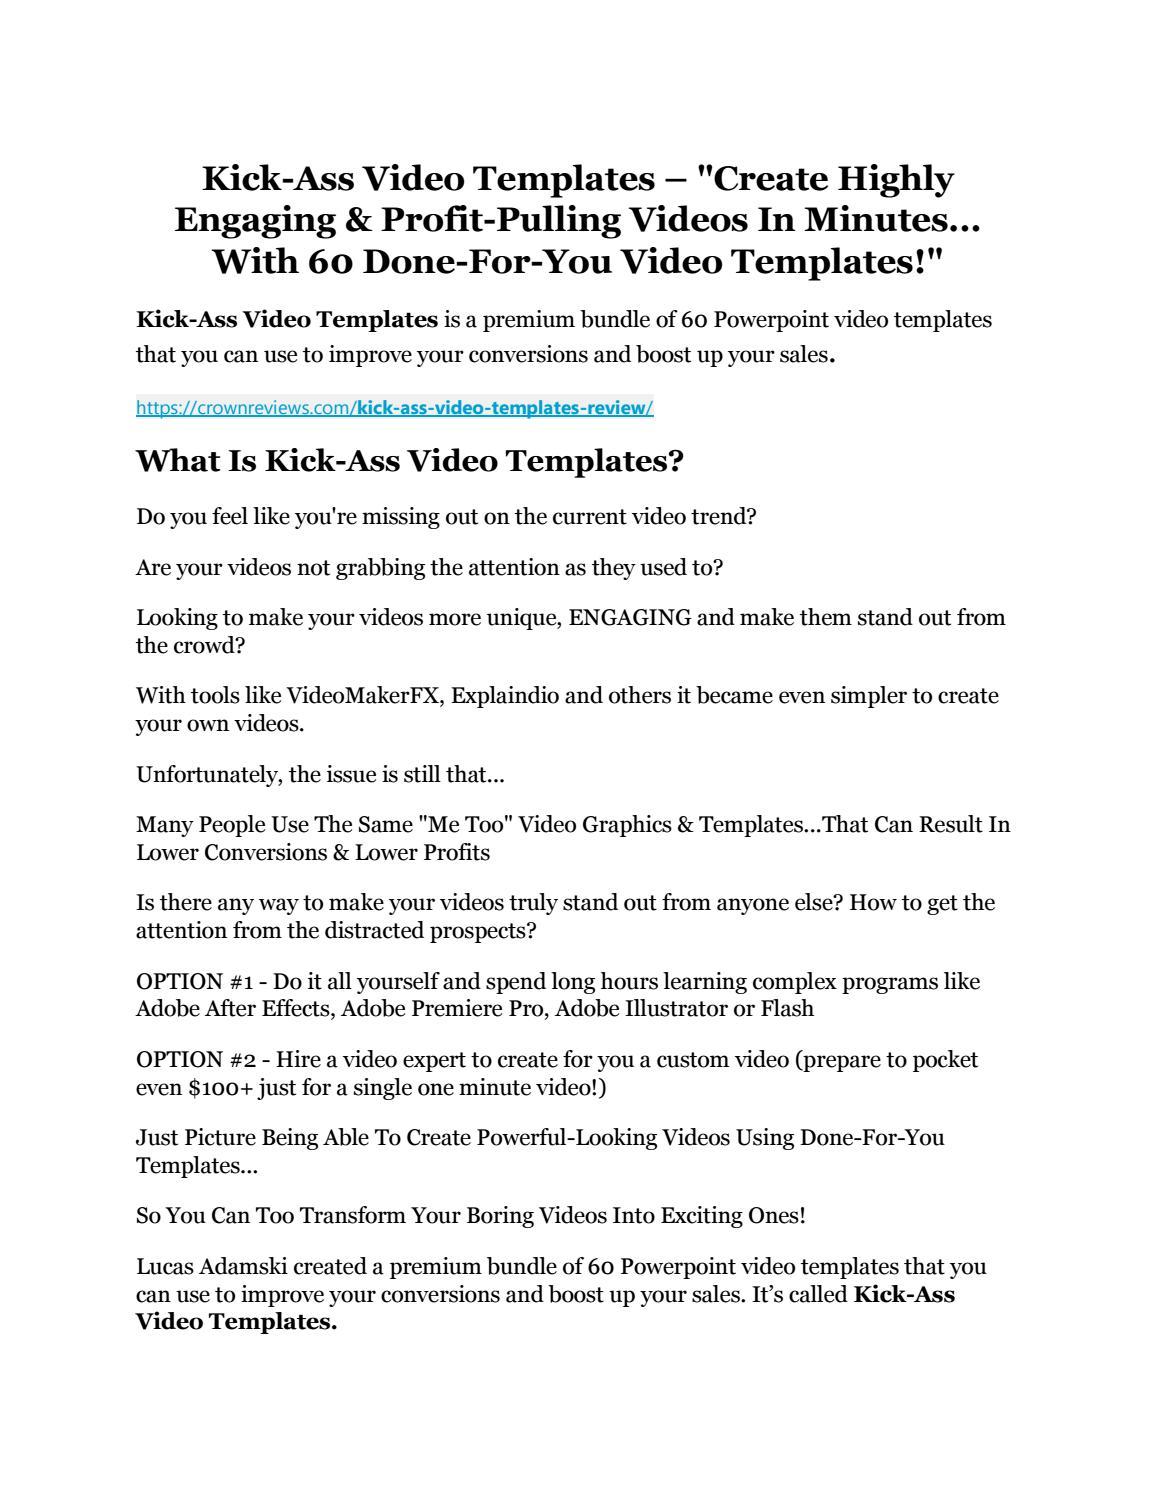 Ass Com Videos kick-ass video templates review - i was shocked!pehelifo